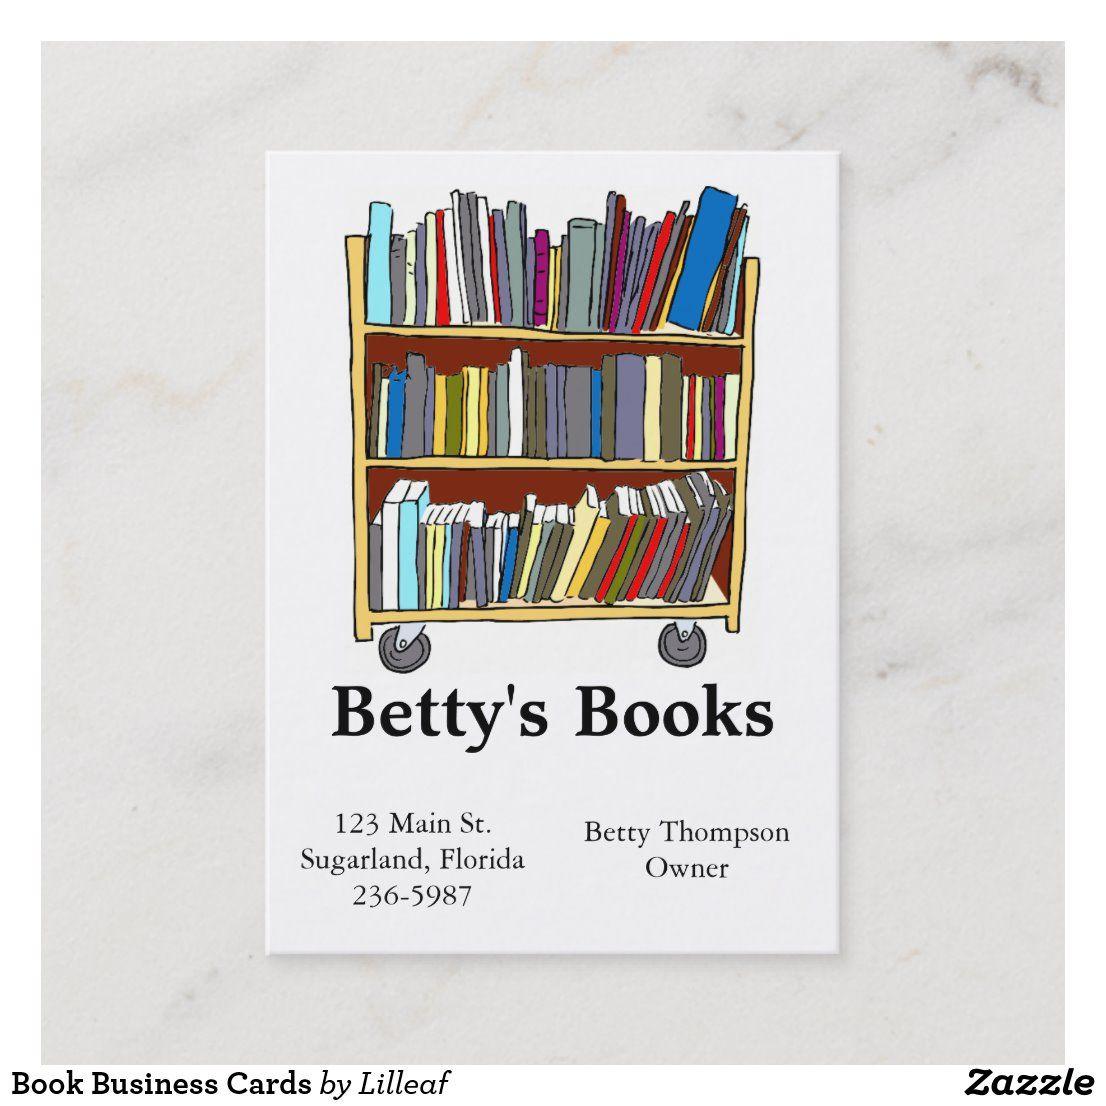 Book Business Cards Zazzle Com Business Card Books Card Book Business Cards